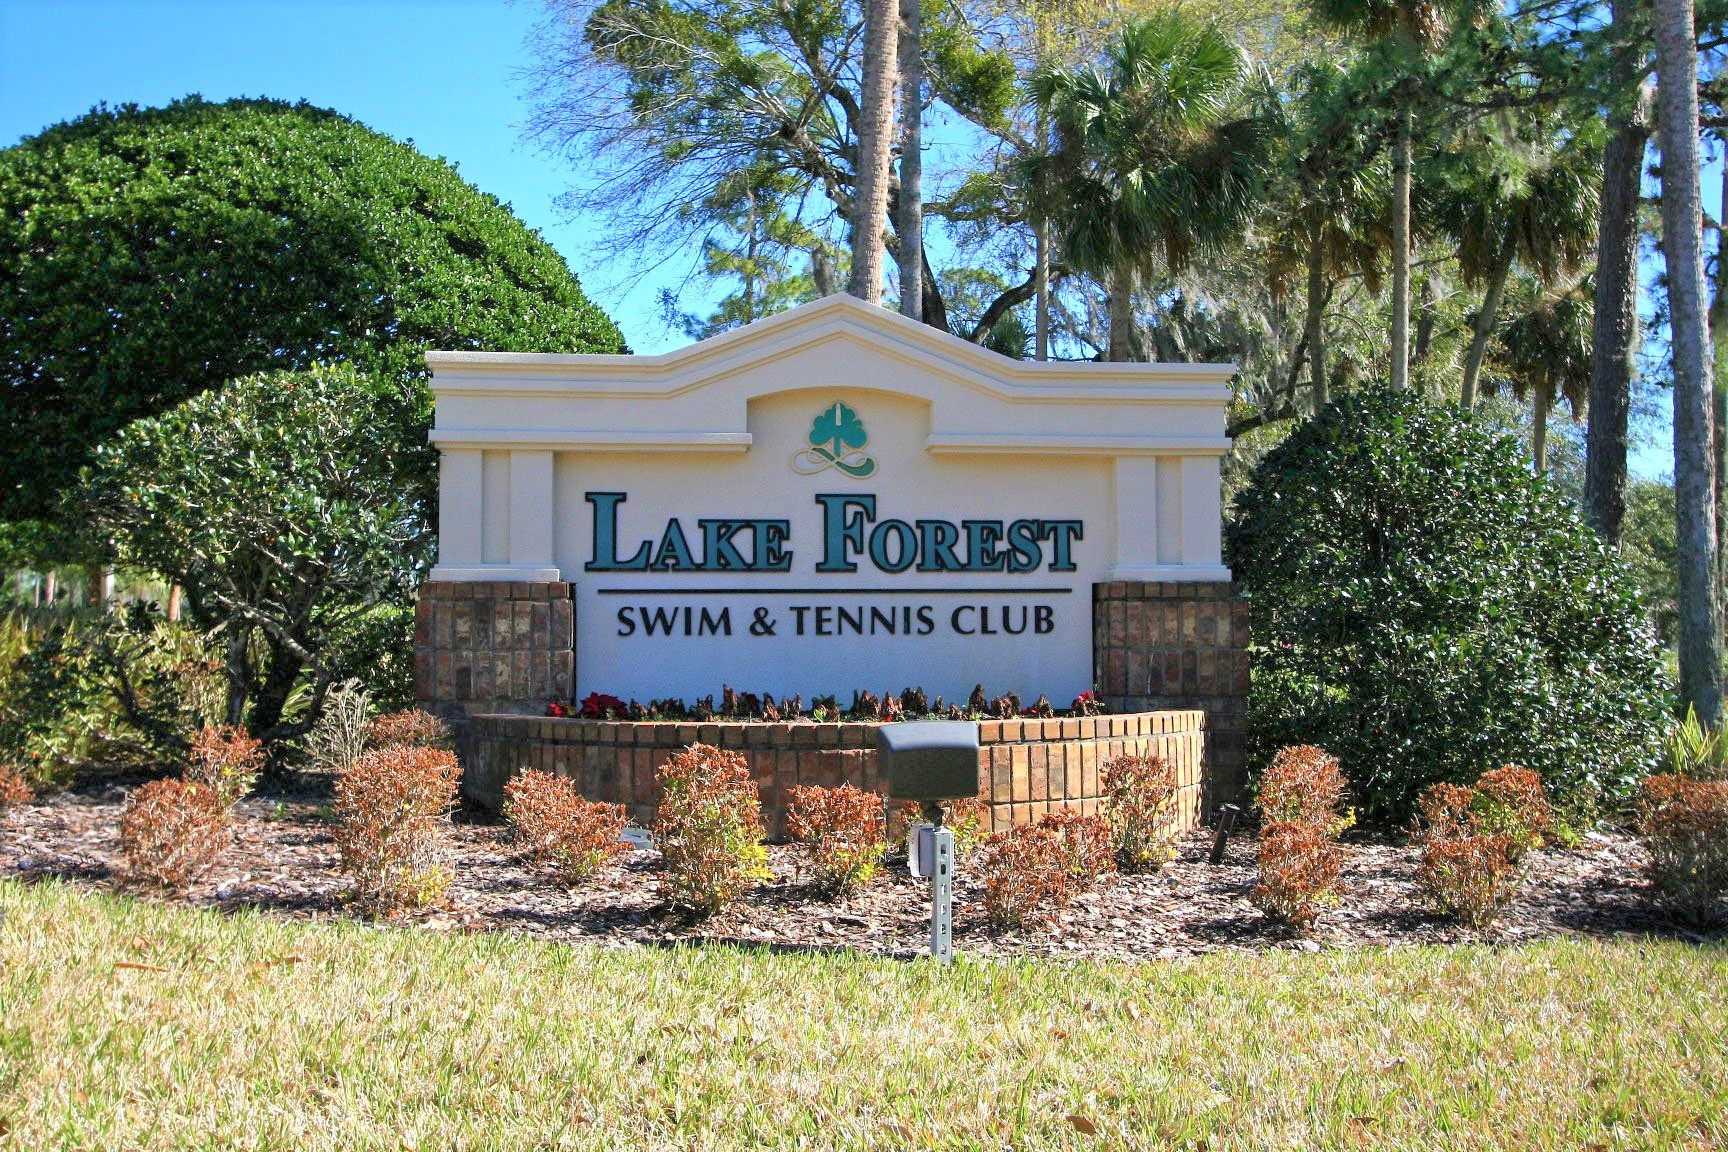 lake-forest-community-mls-hid518673-roomlakeforest.jpg